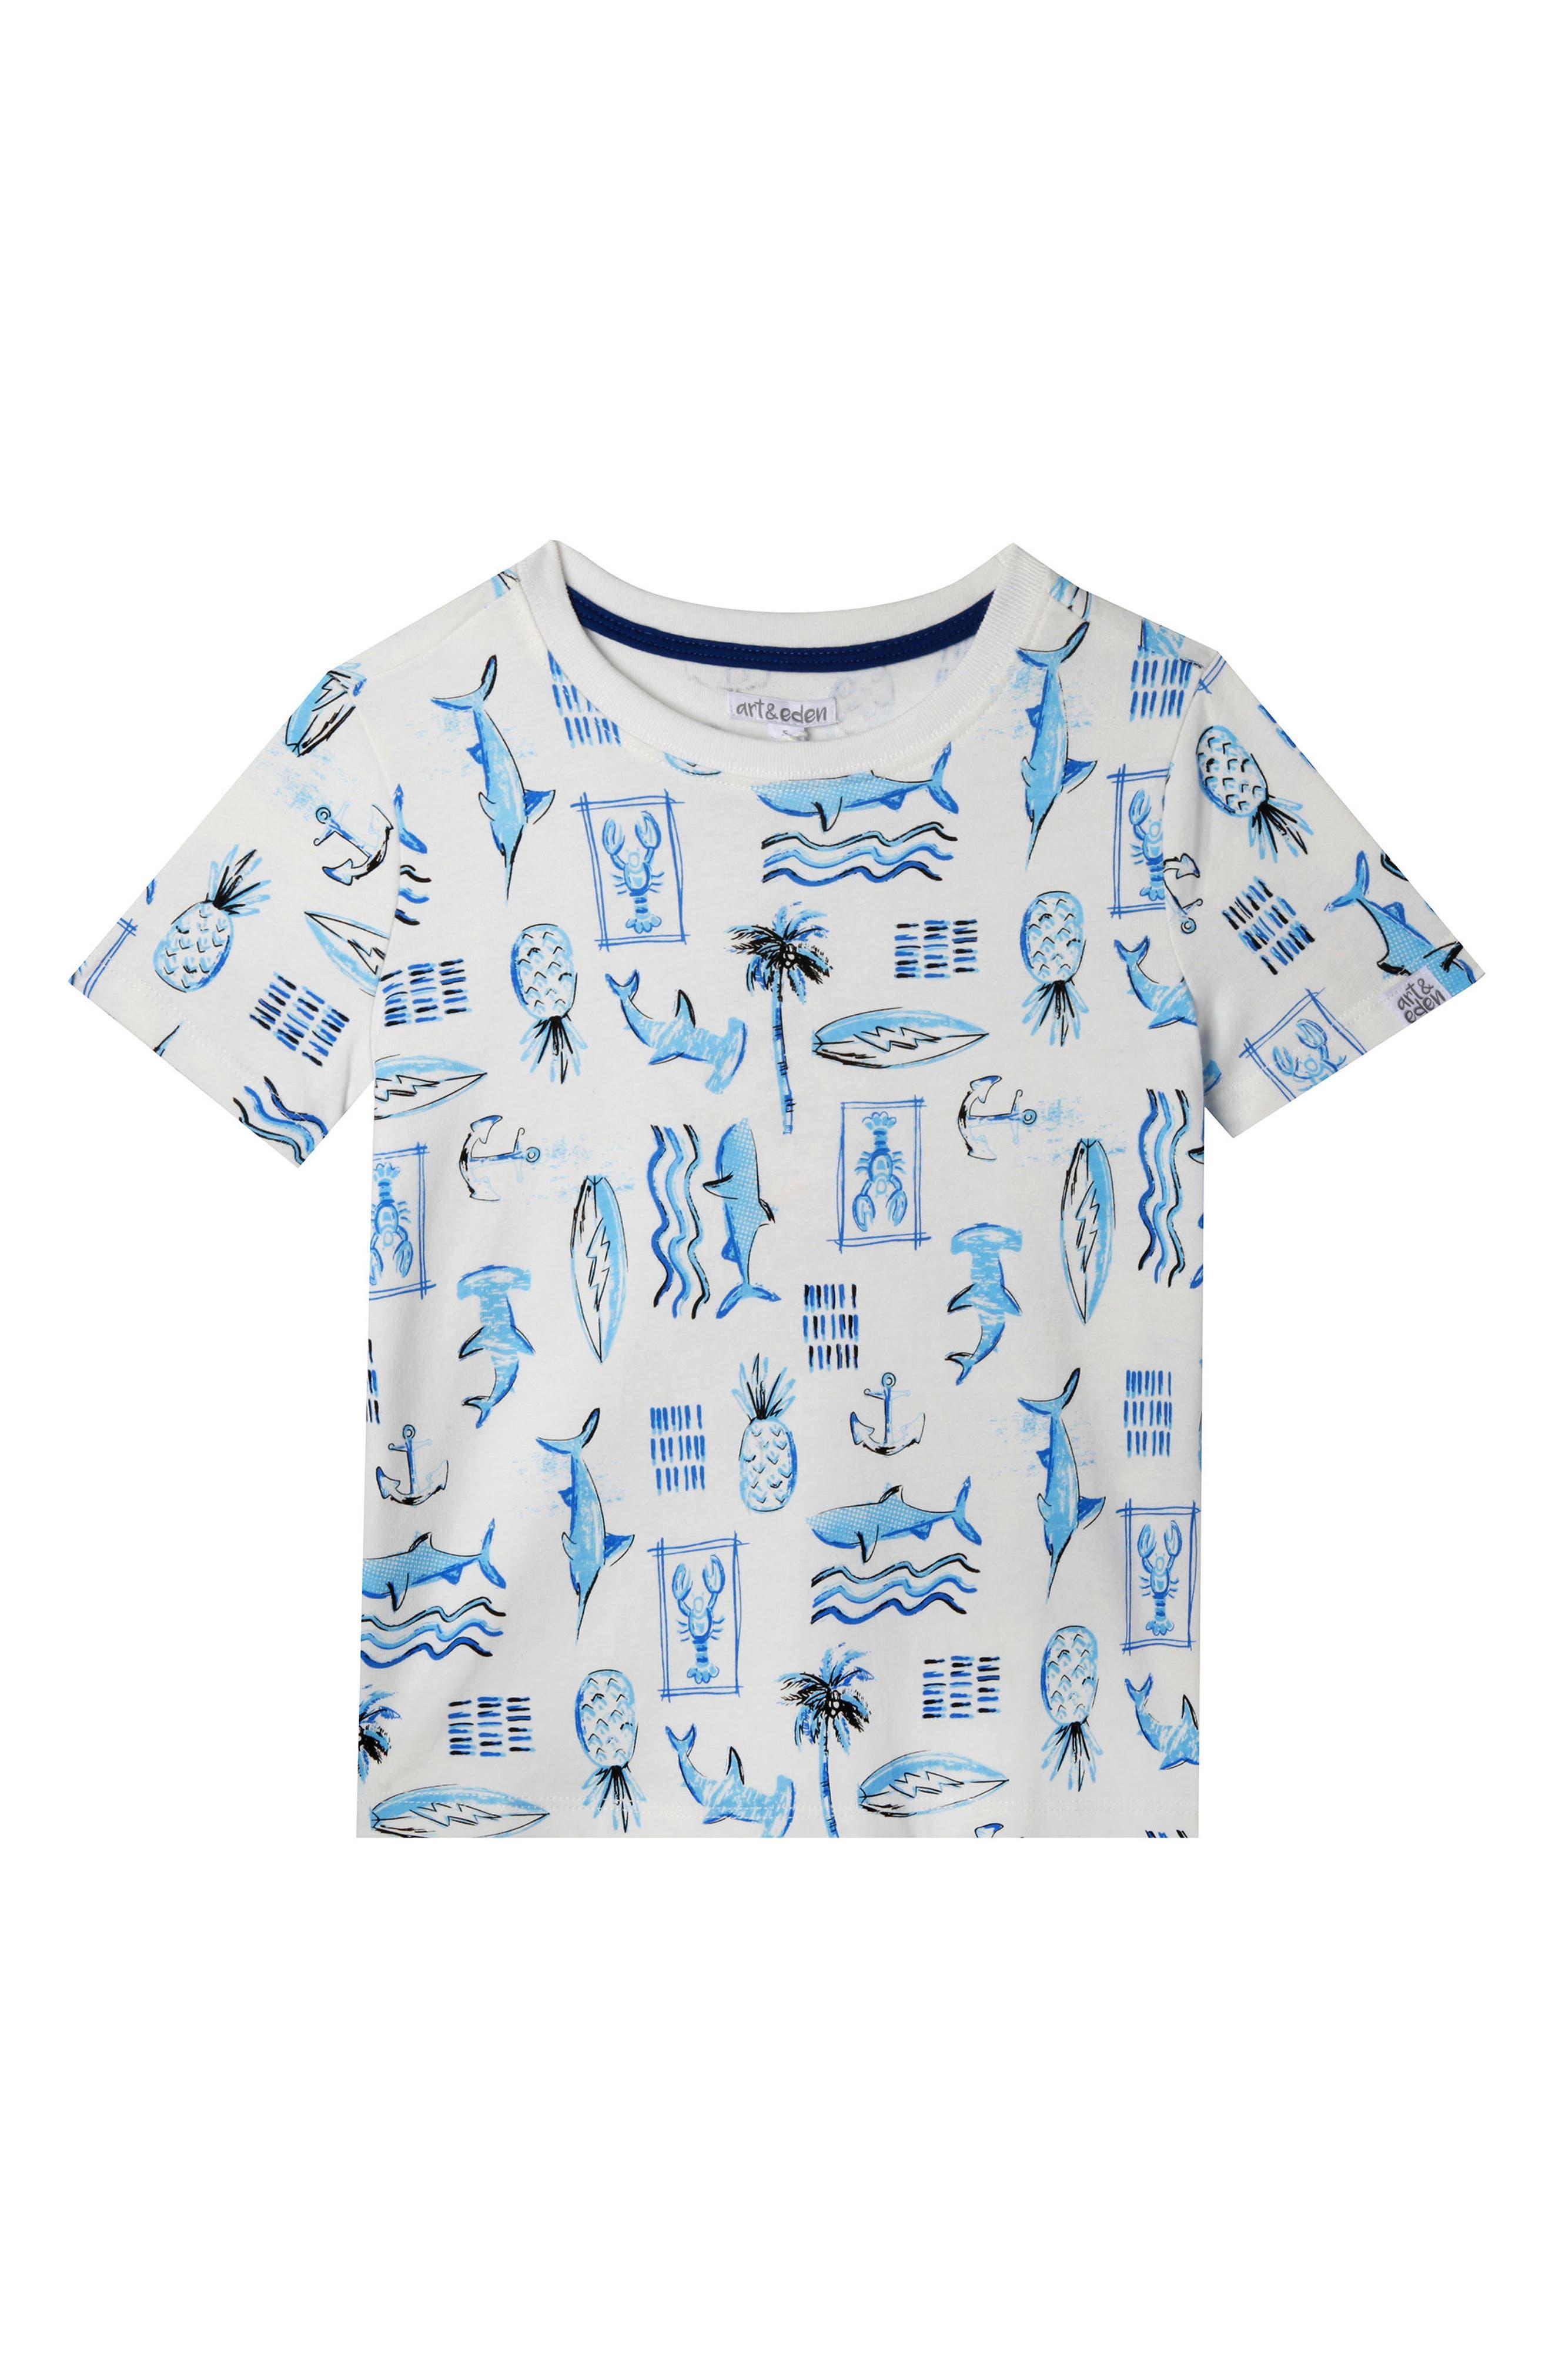 Art & Eden William Nautical Organic Cotton T-Shirt (Toddler Boys, Little Boys & Big Boys)